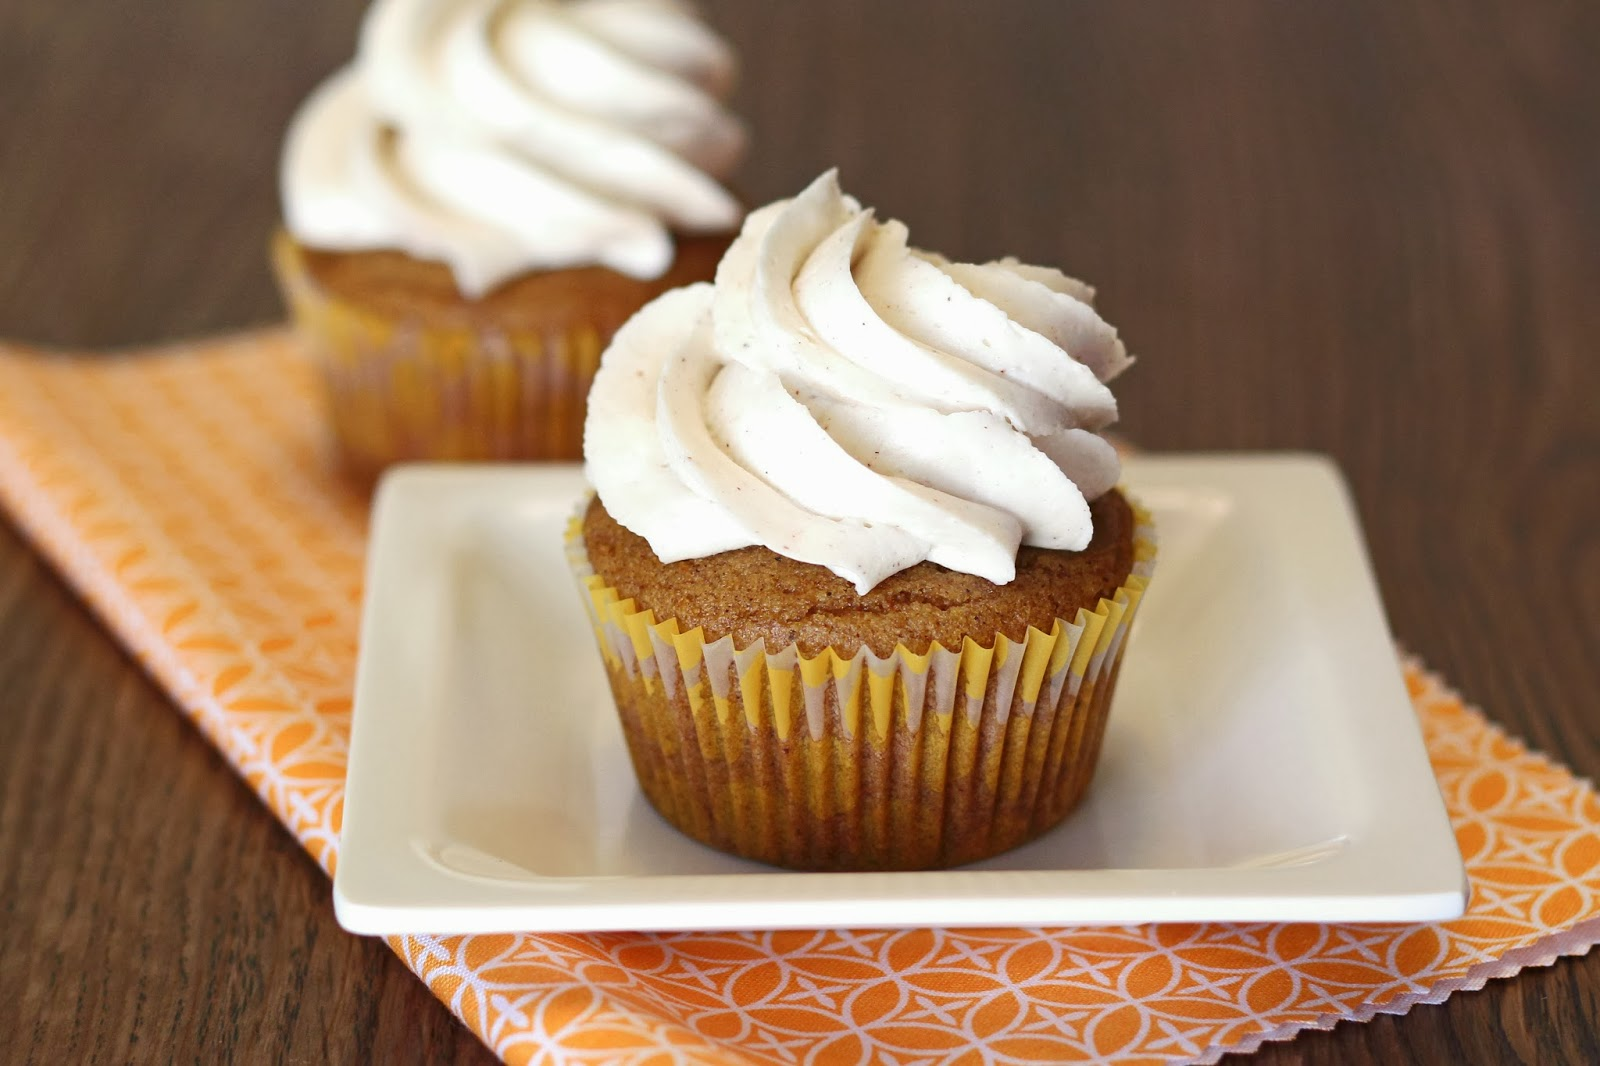 ... Bakes Gluten Free Treats: gluten free vegan pumpkin spice cupcakes